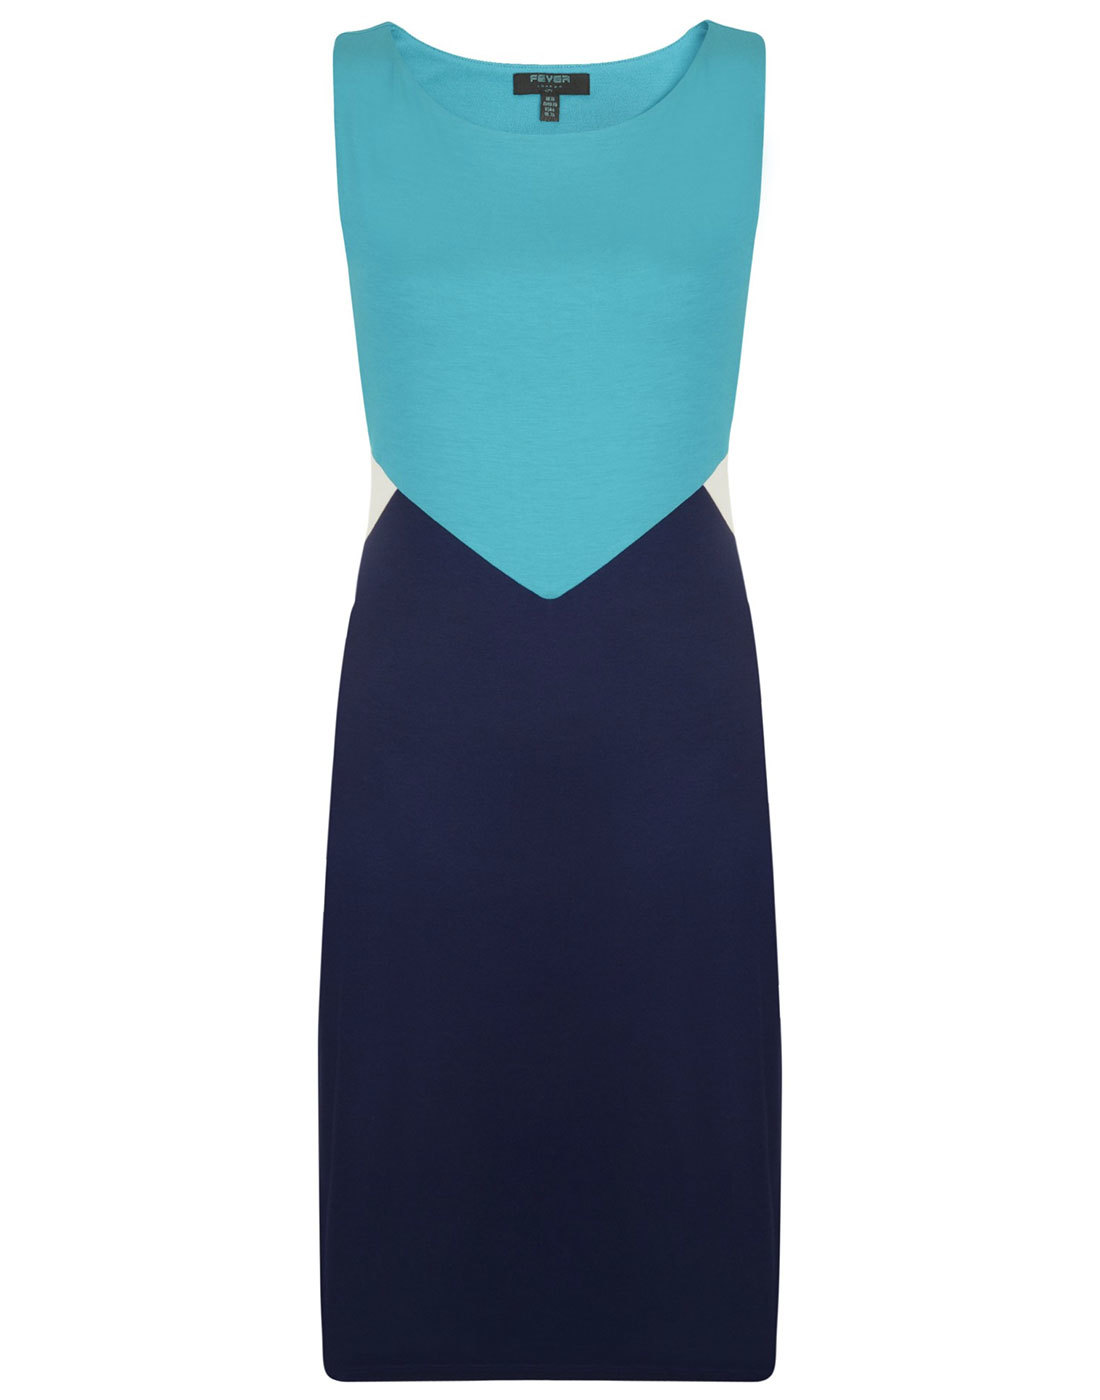 Robin FEVER Retro 1960s Mod Chevron Diamond Dress